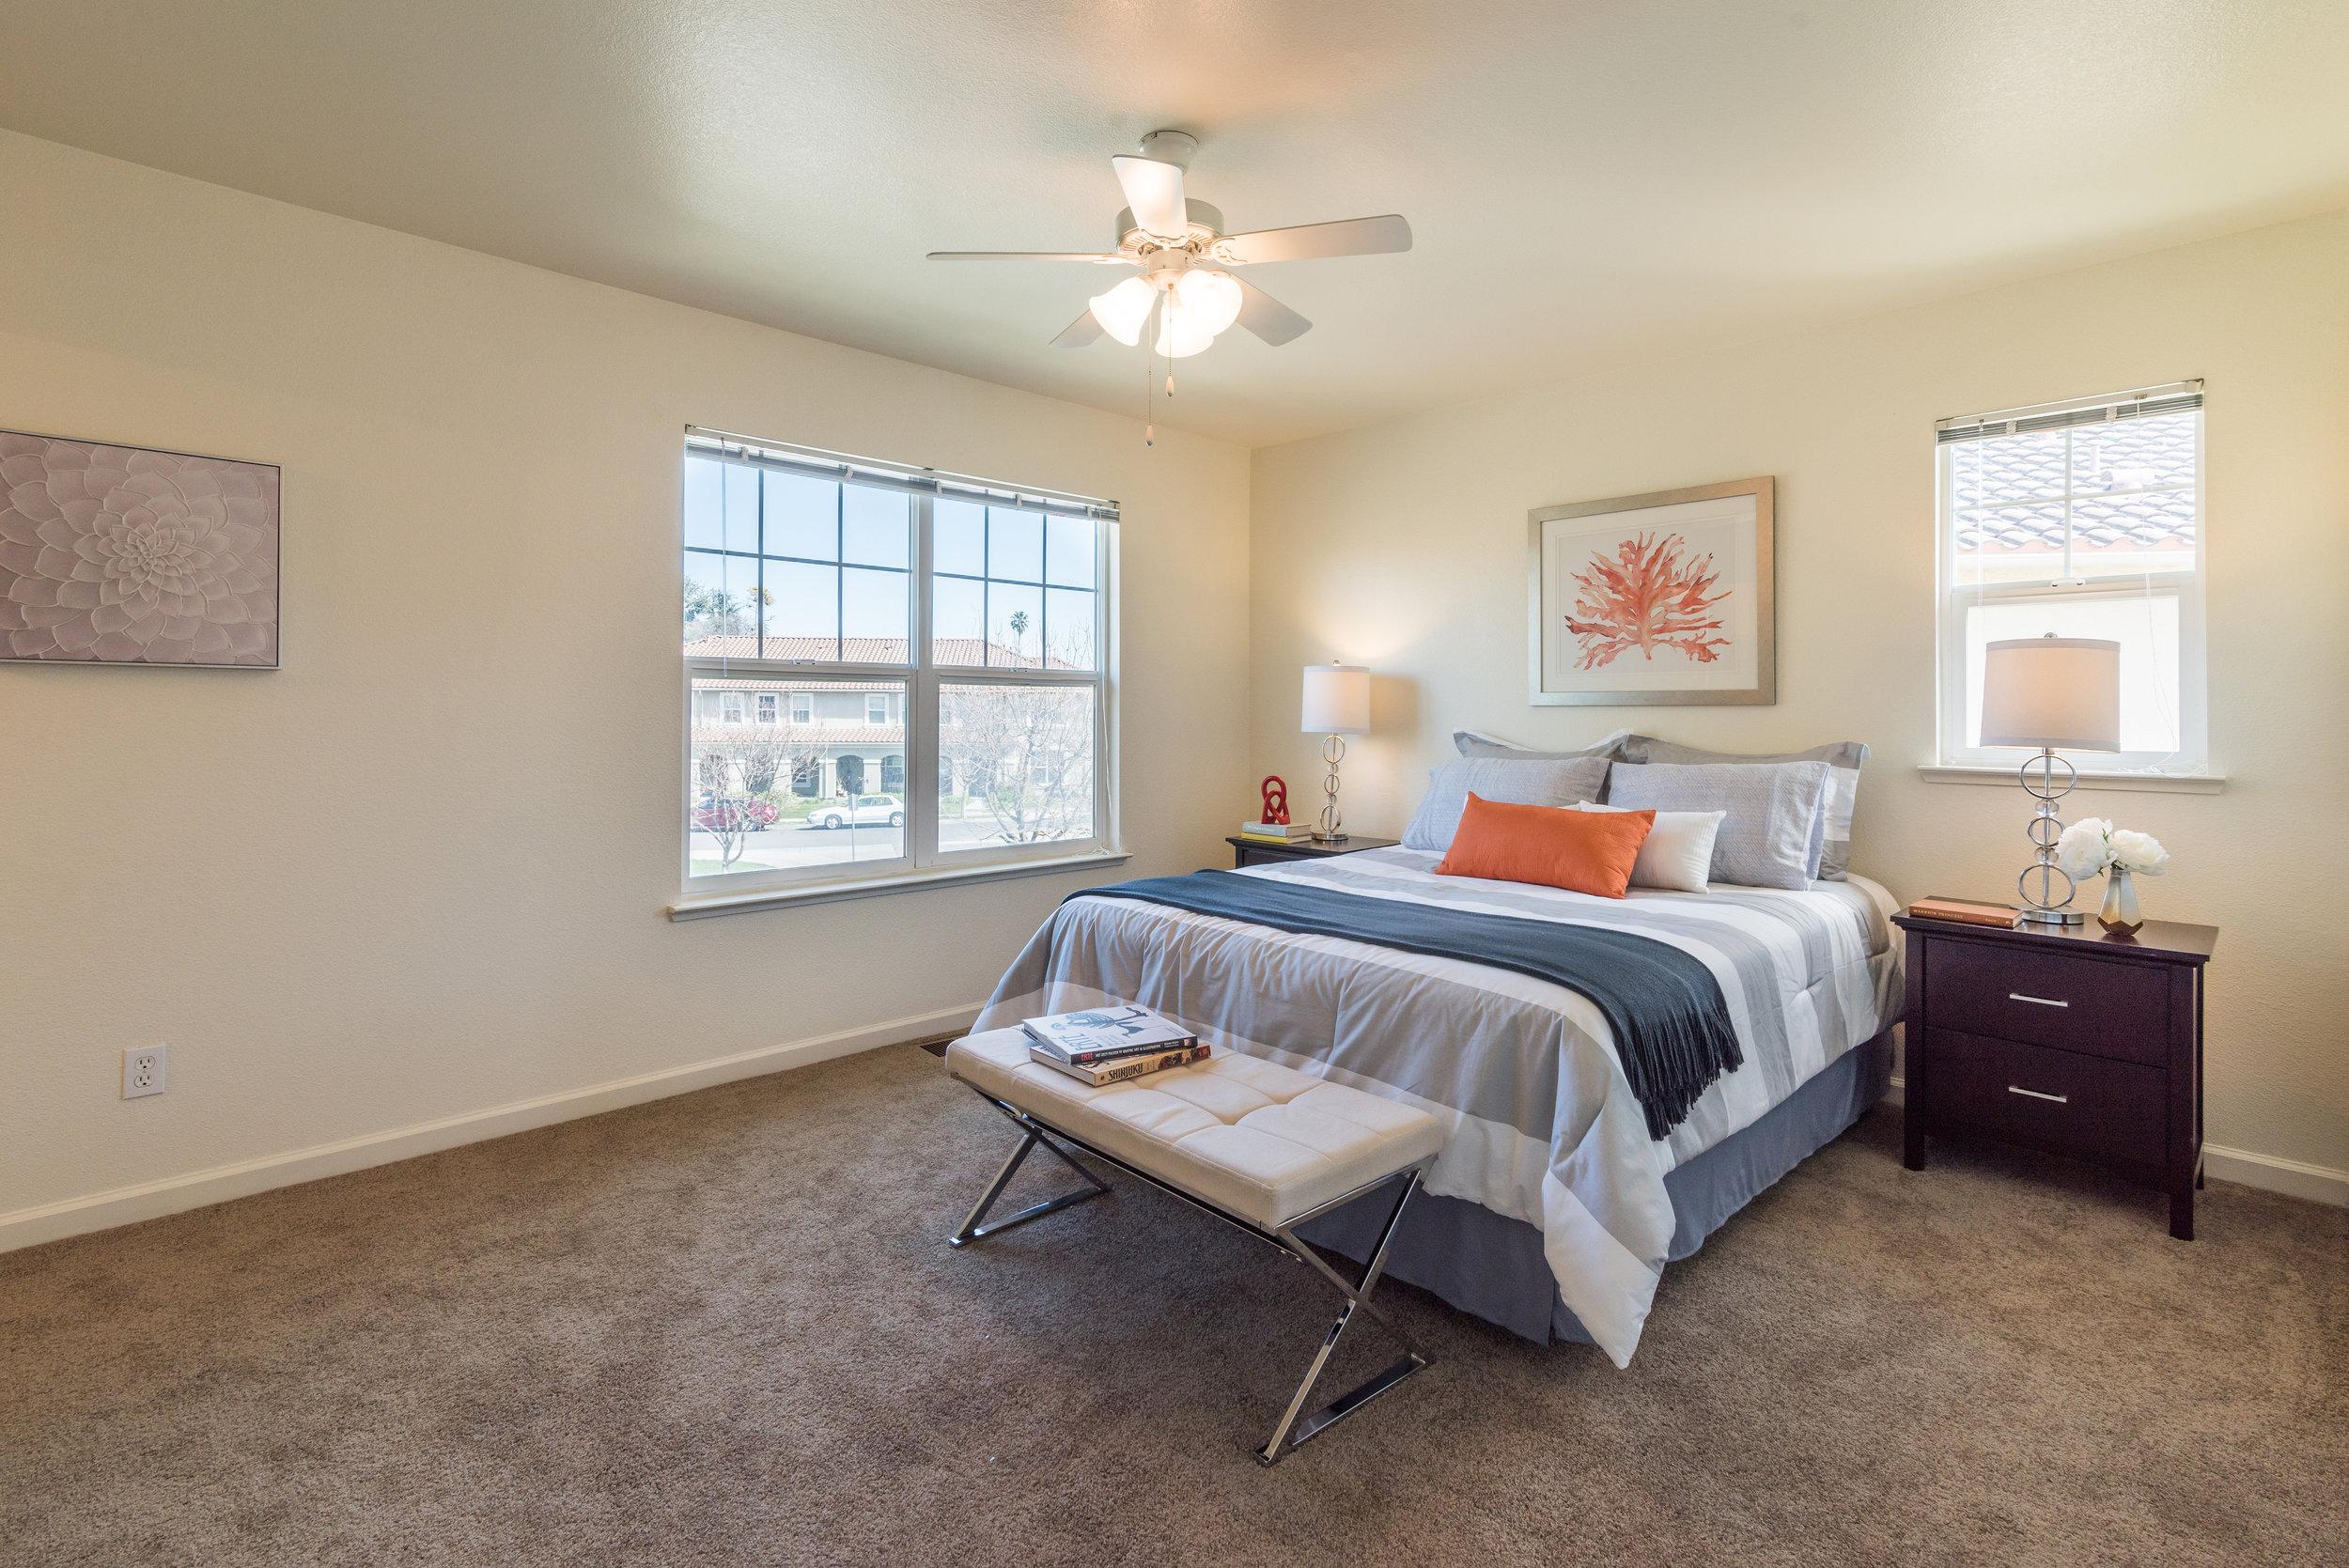 Master Bedroom in Rental Home